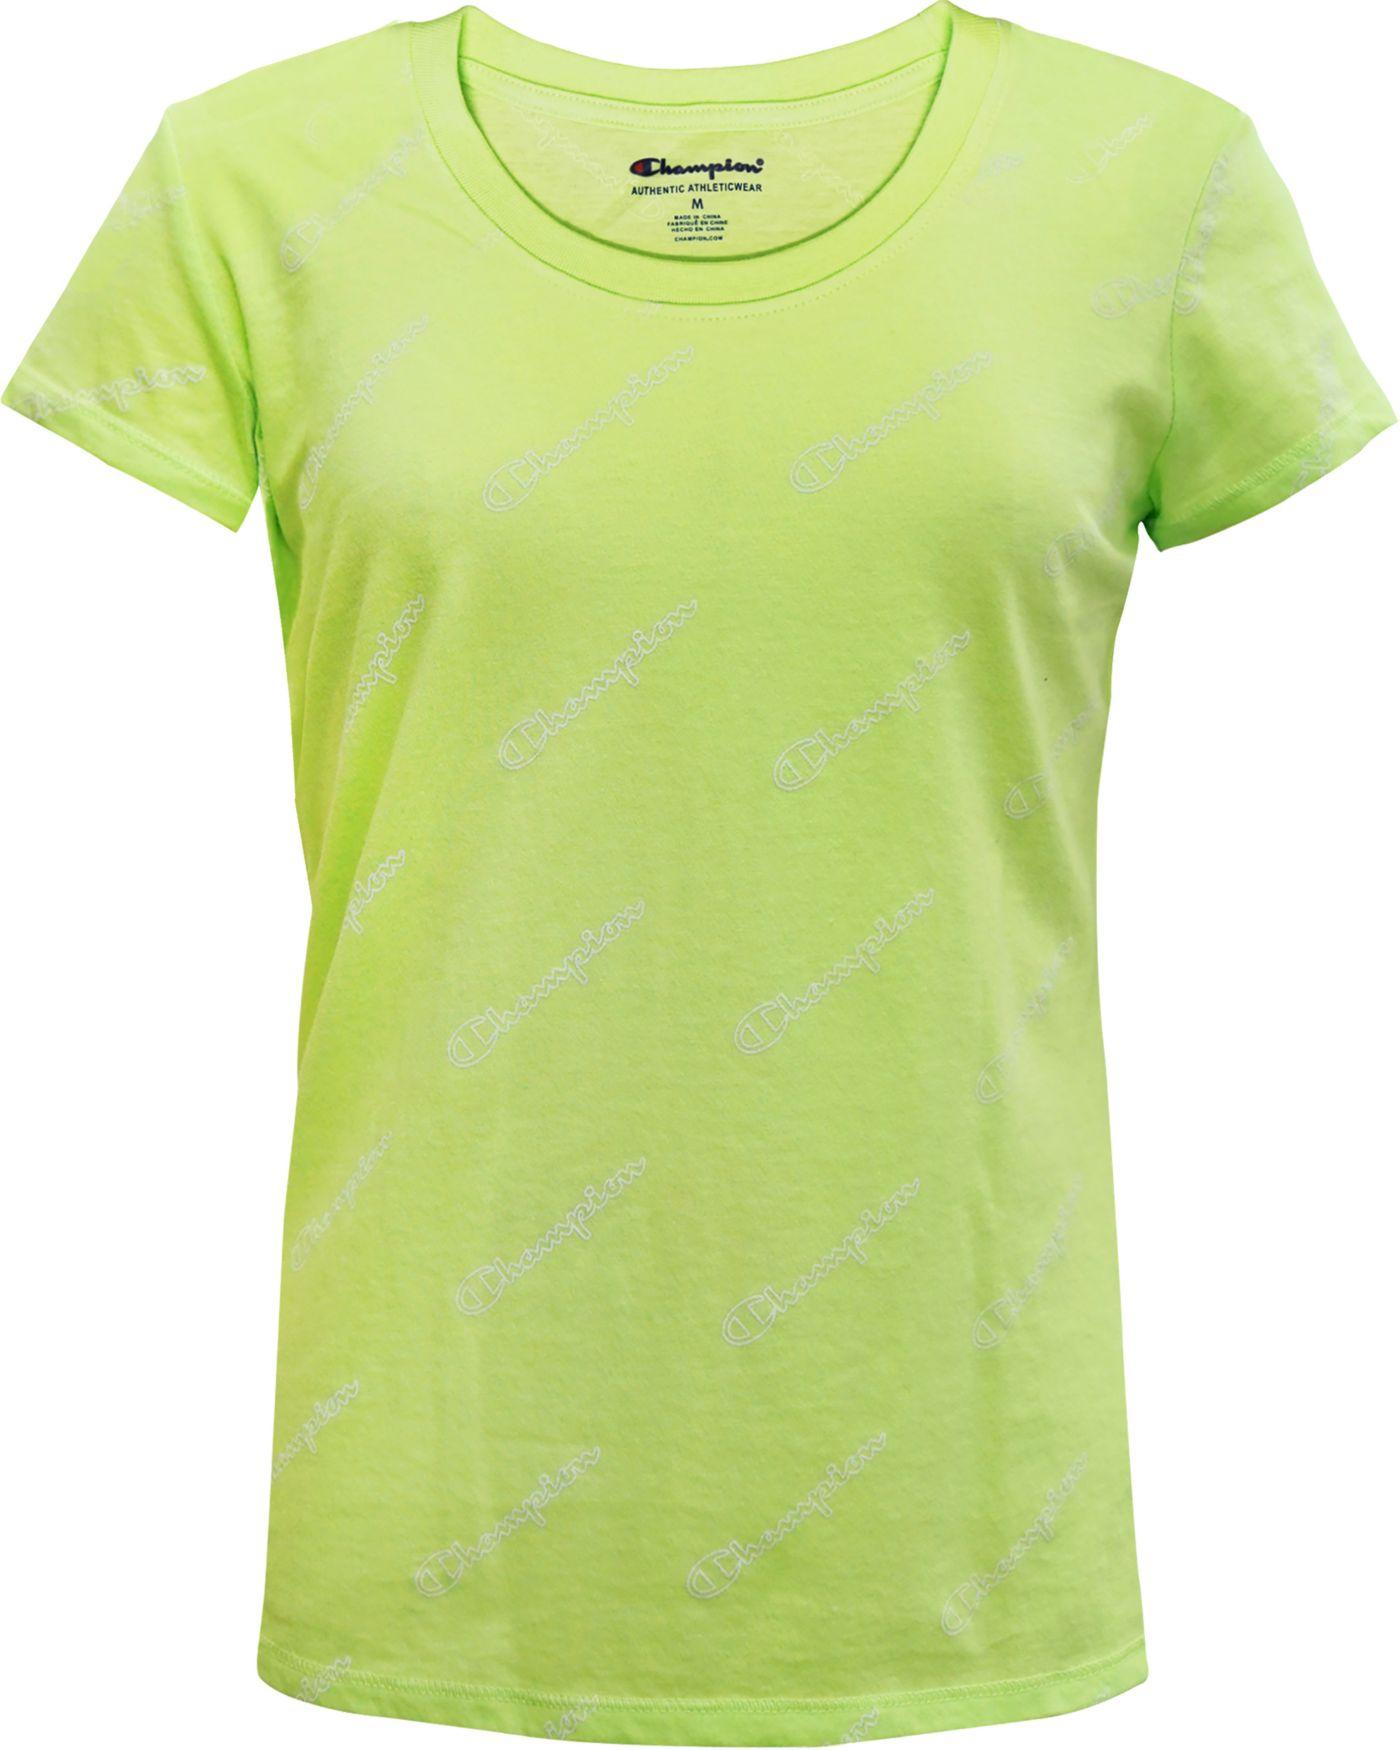 Champion Girls' Small Script Print T-Shirt